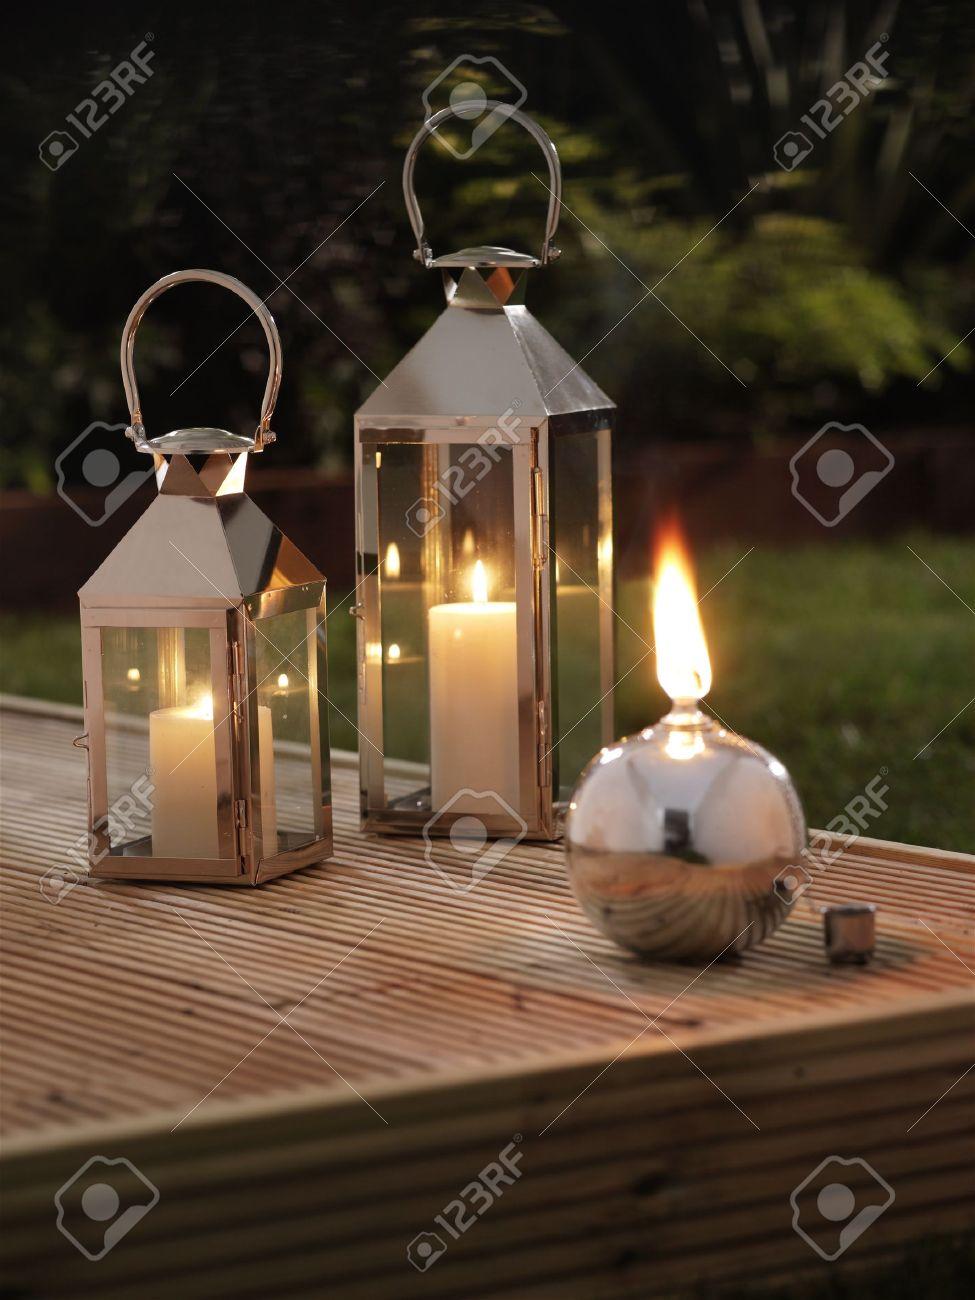 garden lanterns on a deck stock photo - 9856367 XWRUWZY